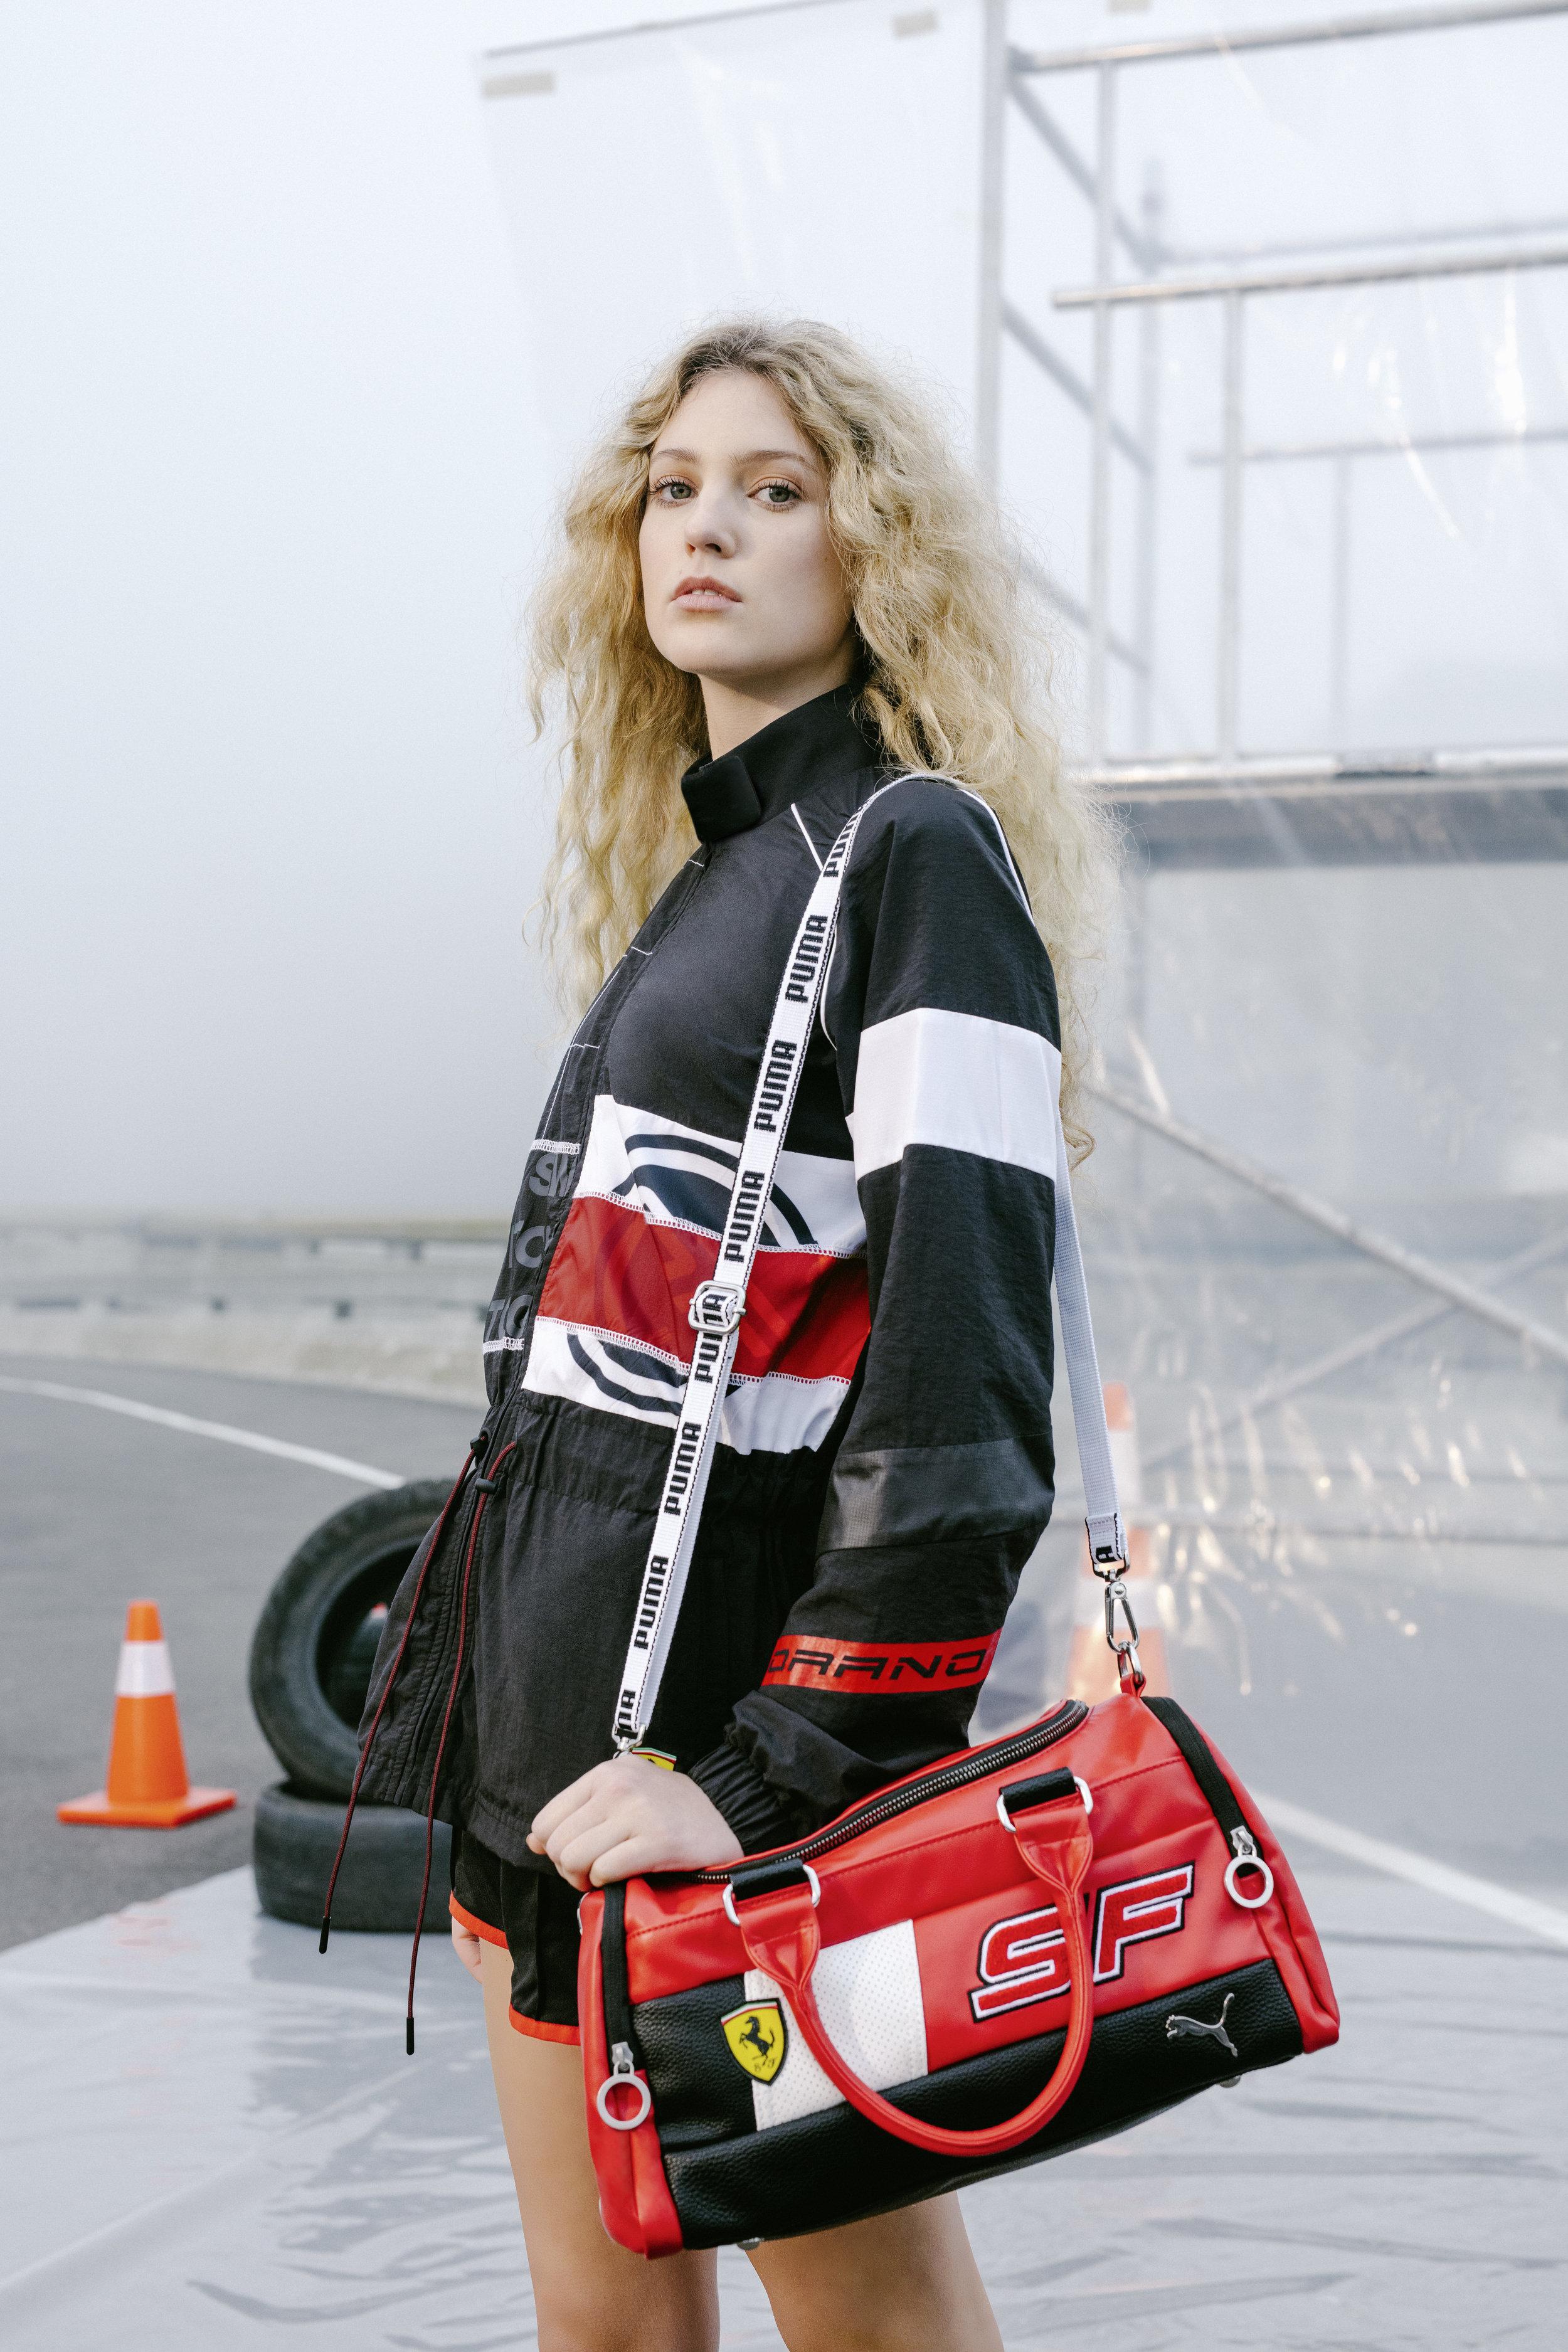 19SS_xMS_Ferrari_Fanwear_Female-Model-Jacket_00072_RGB.jpg